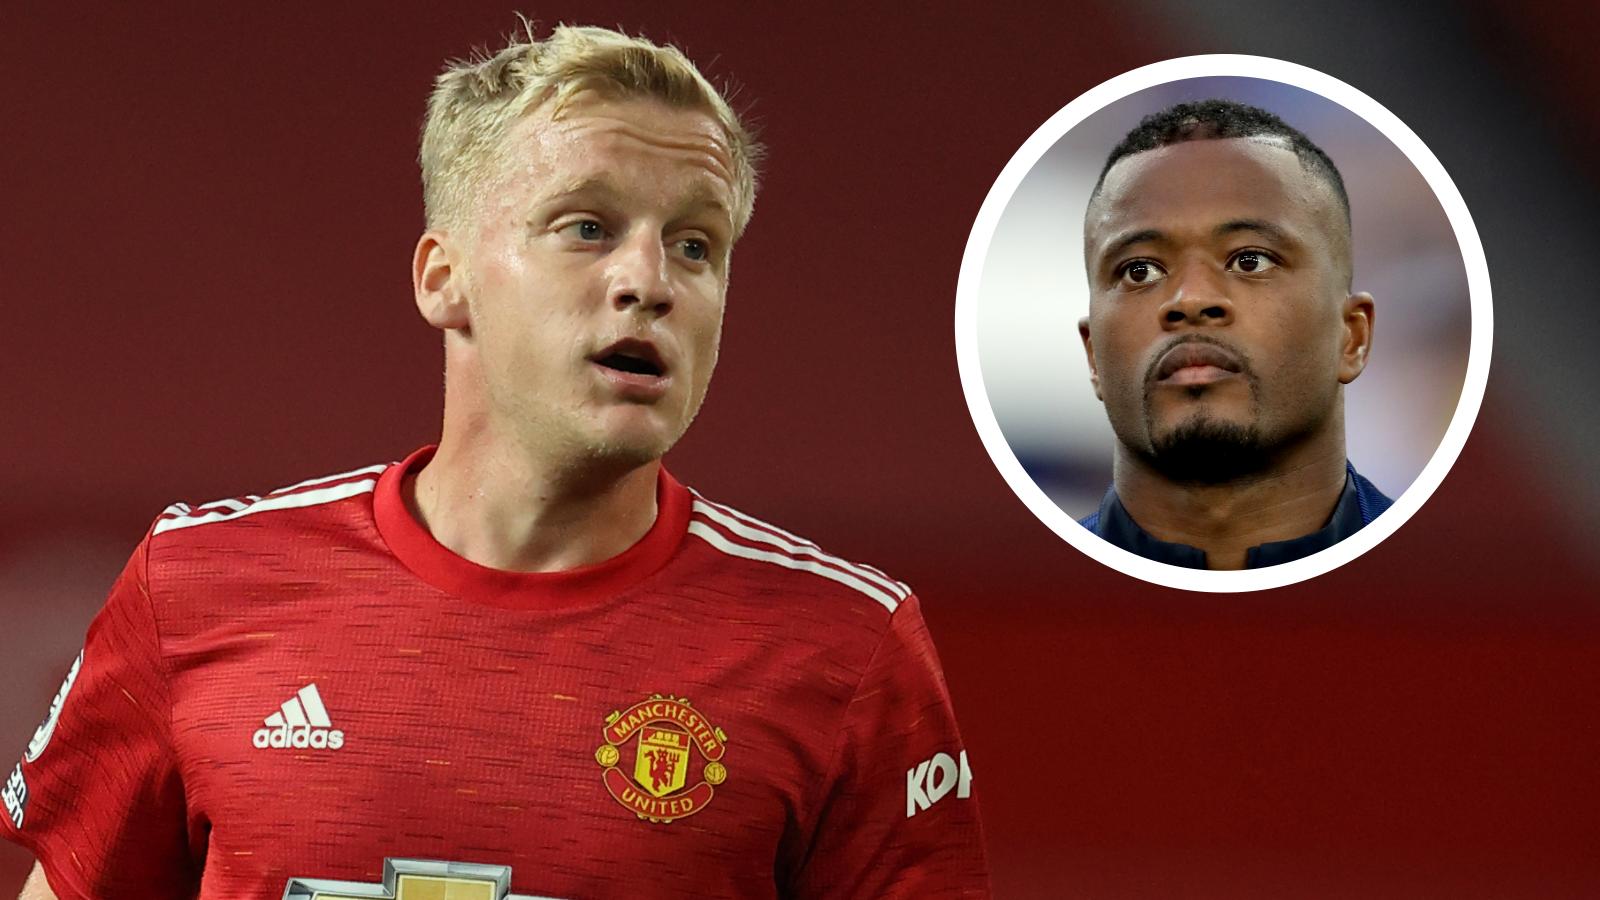 'Van de Beek's agent should shut his mouth' - Evra takes aim after midfielder's agent criticises Manchester United